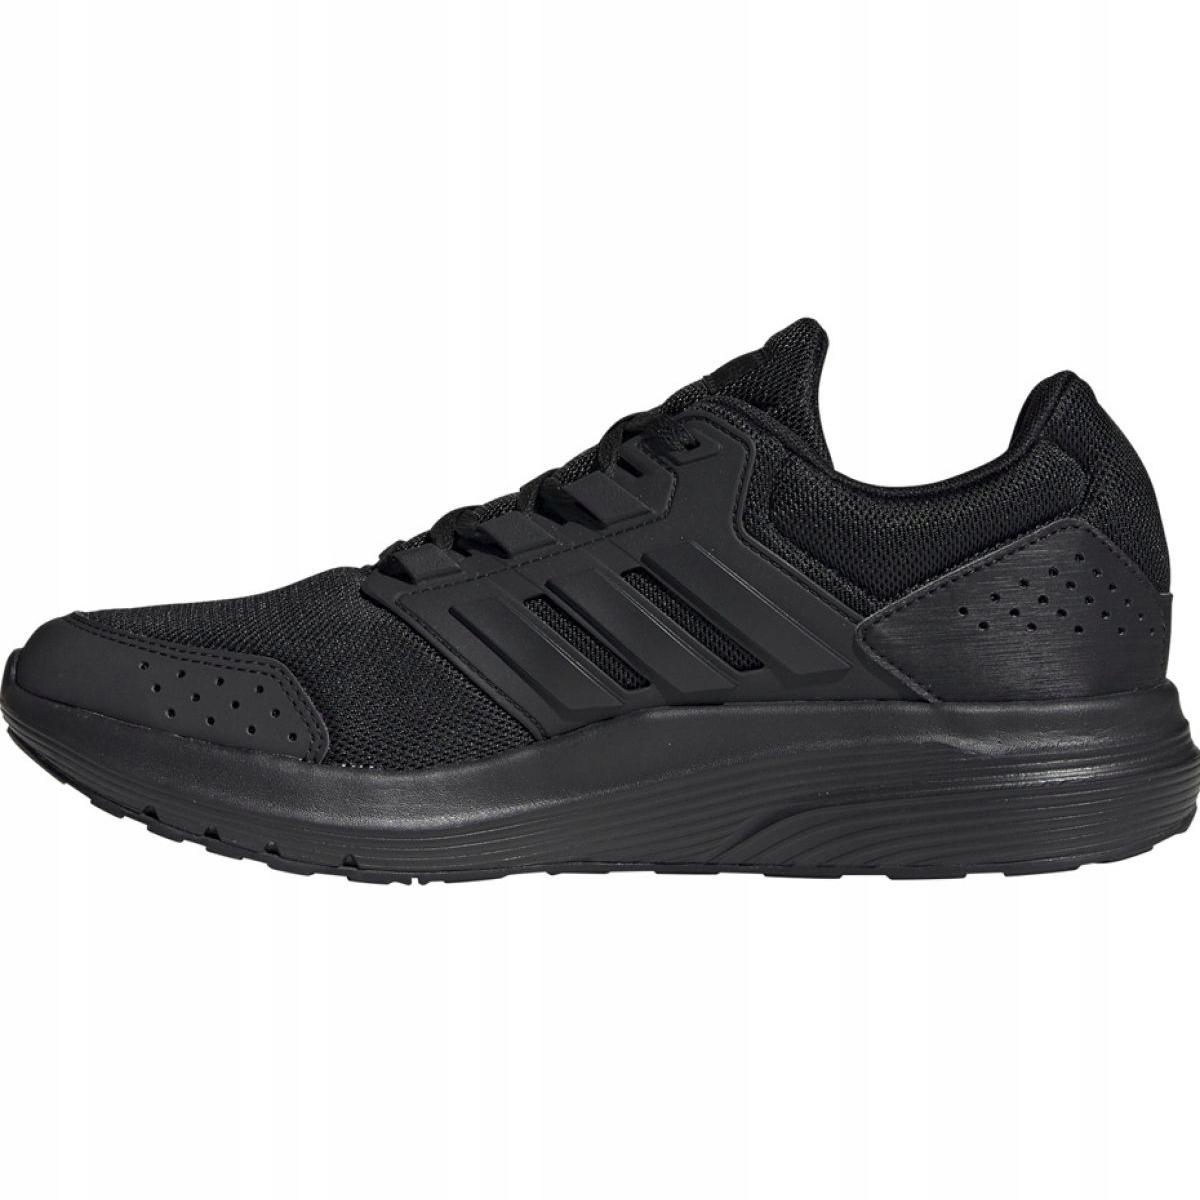 Adidas Galaxy 4 M EE7917 running shoes